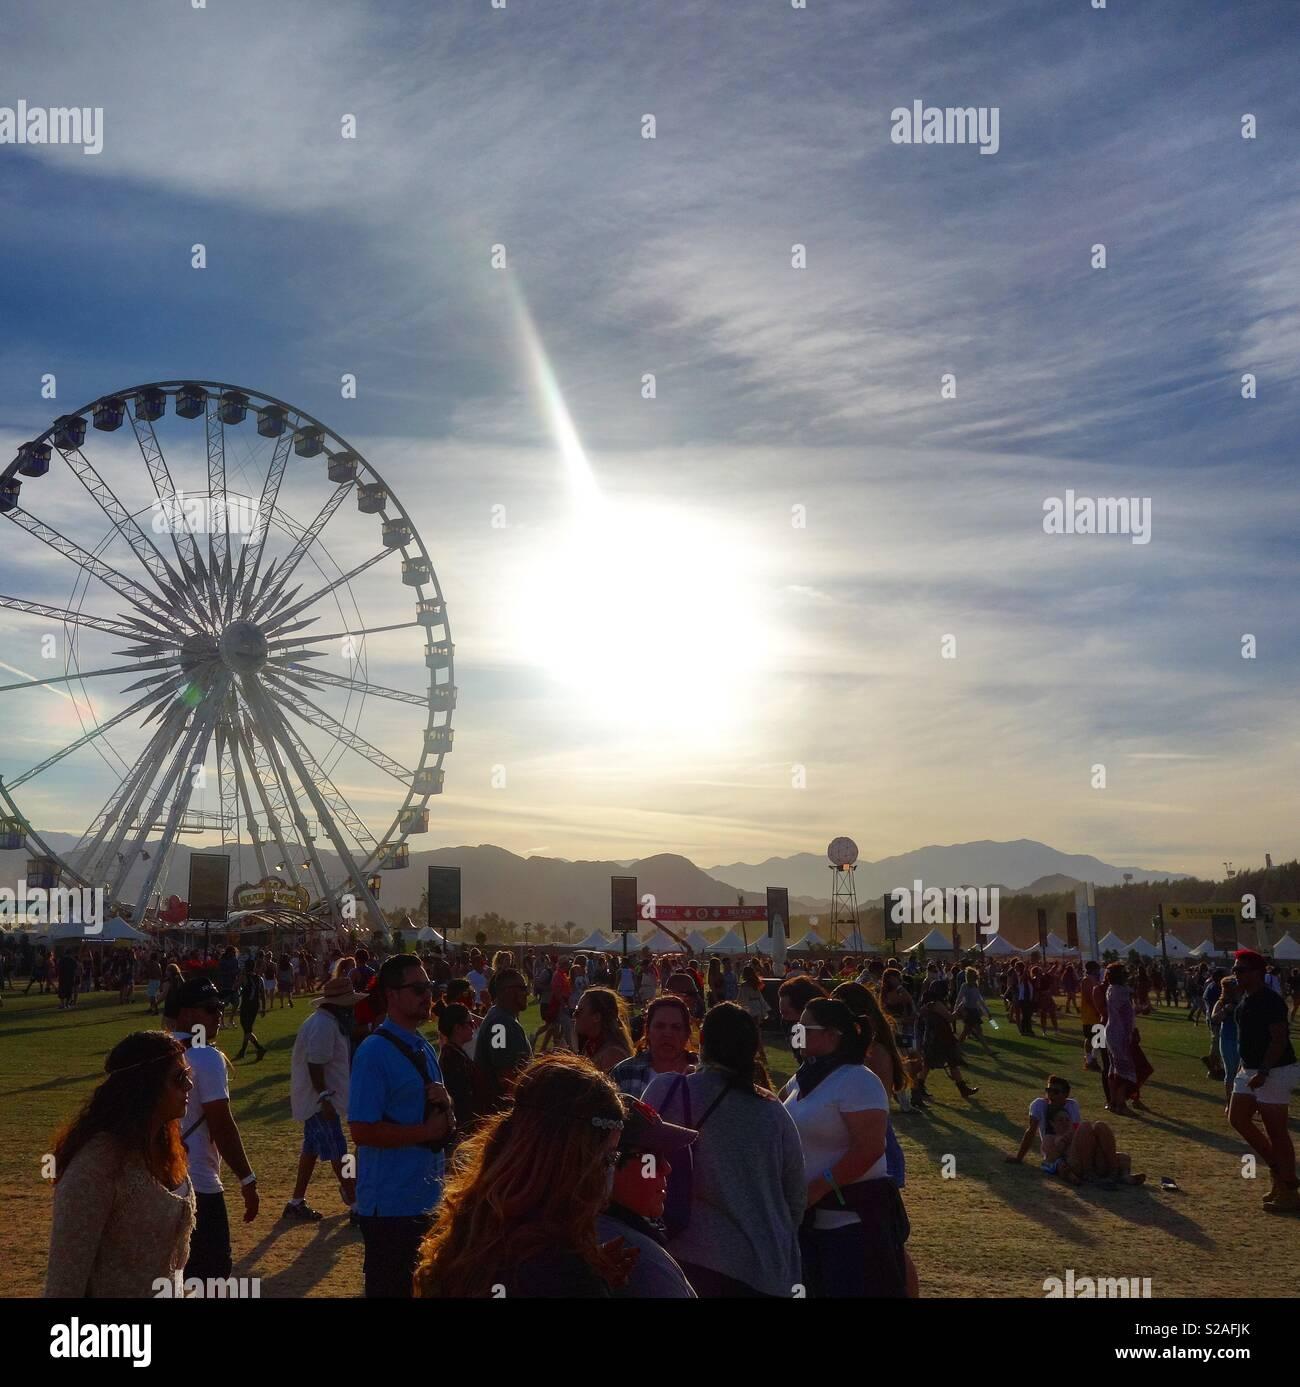 Coachella Festival Stock Photos & Coachella Festival Stock